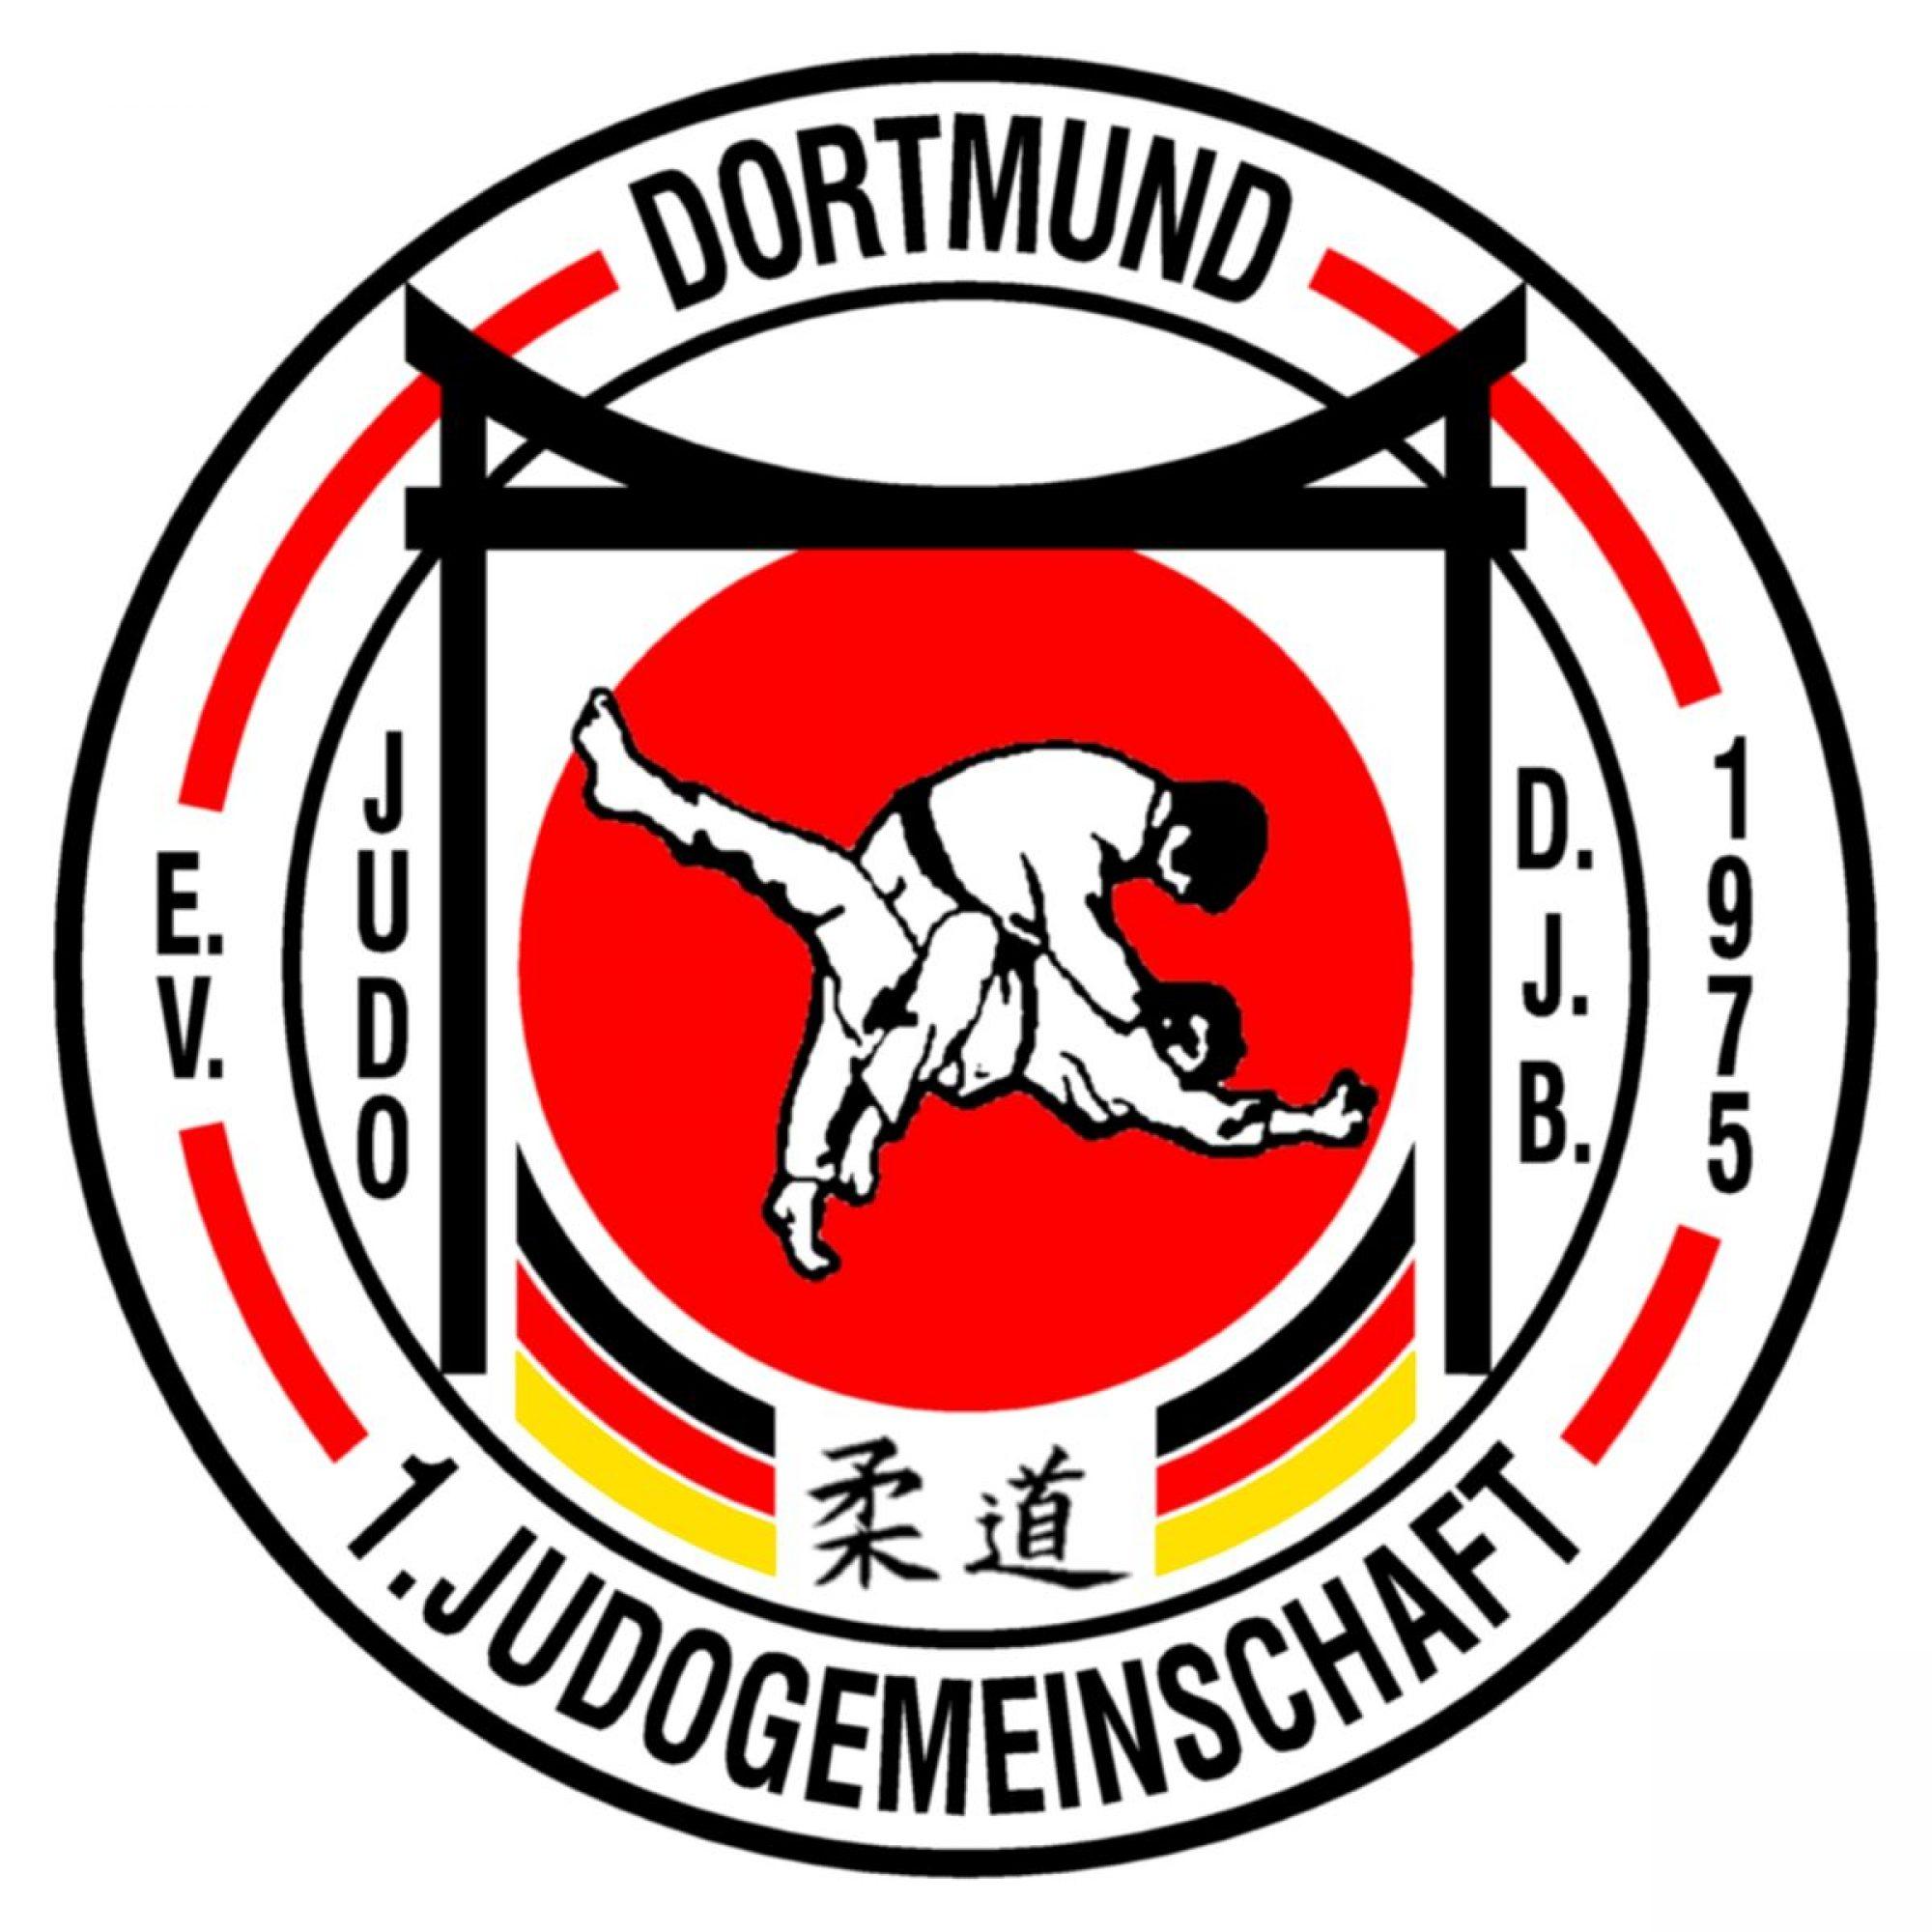 judogemeinschaft-dortmund